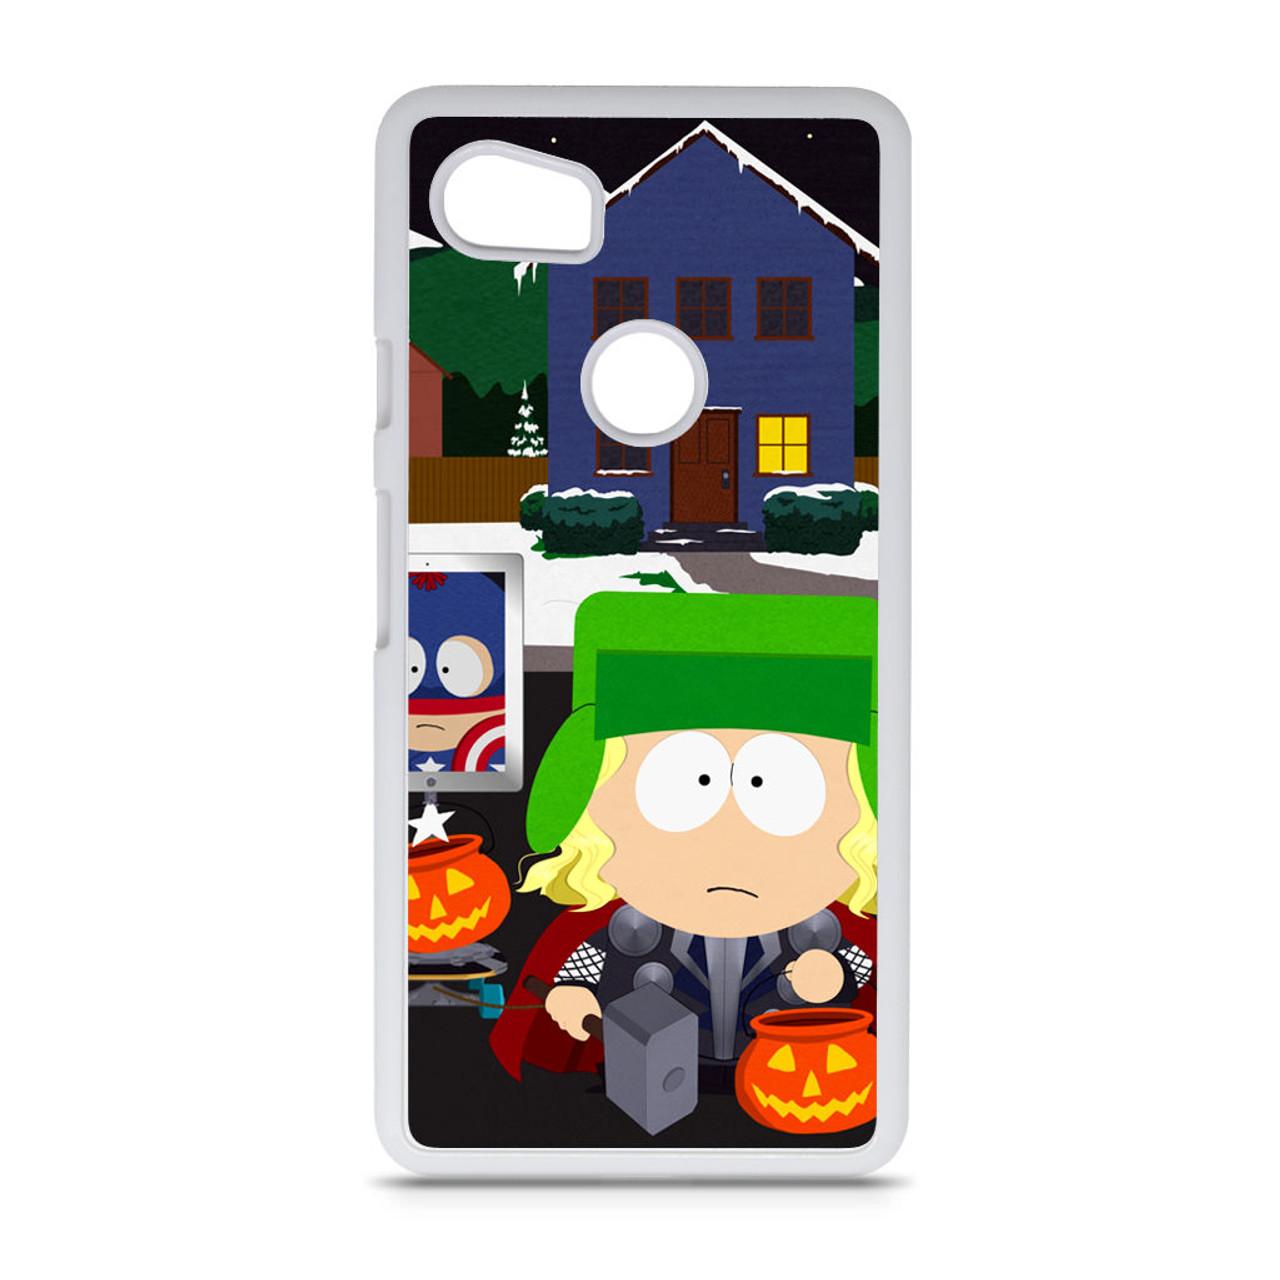 south park logo 2 iphone case